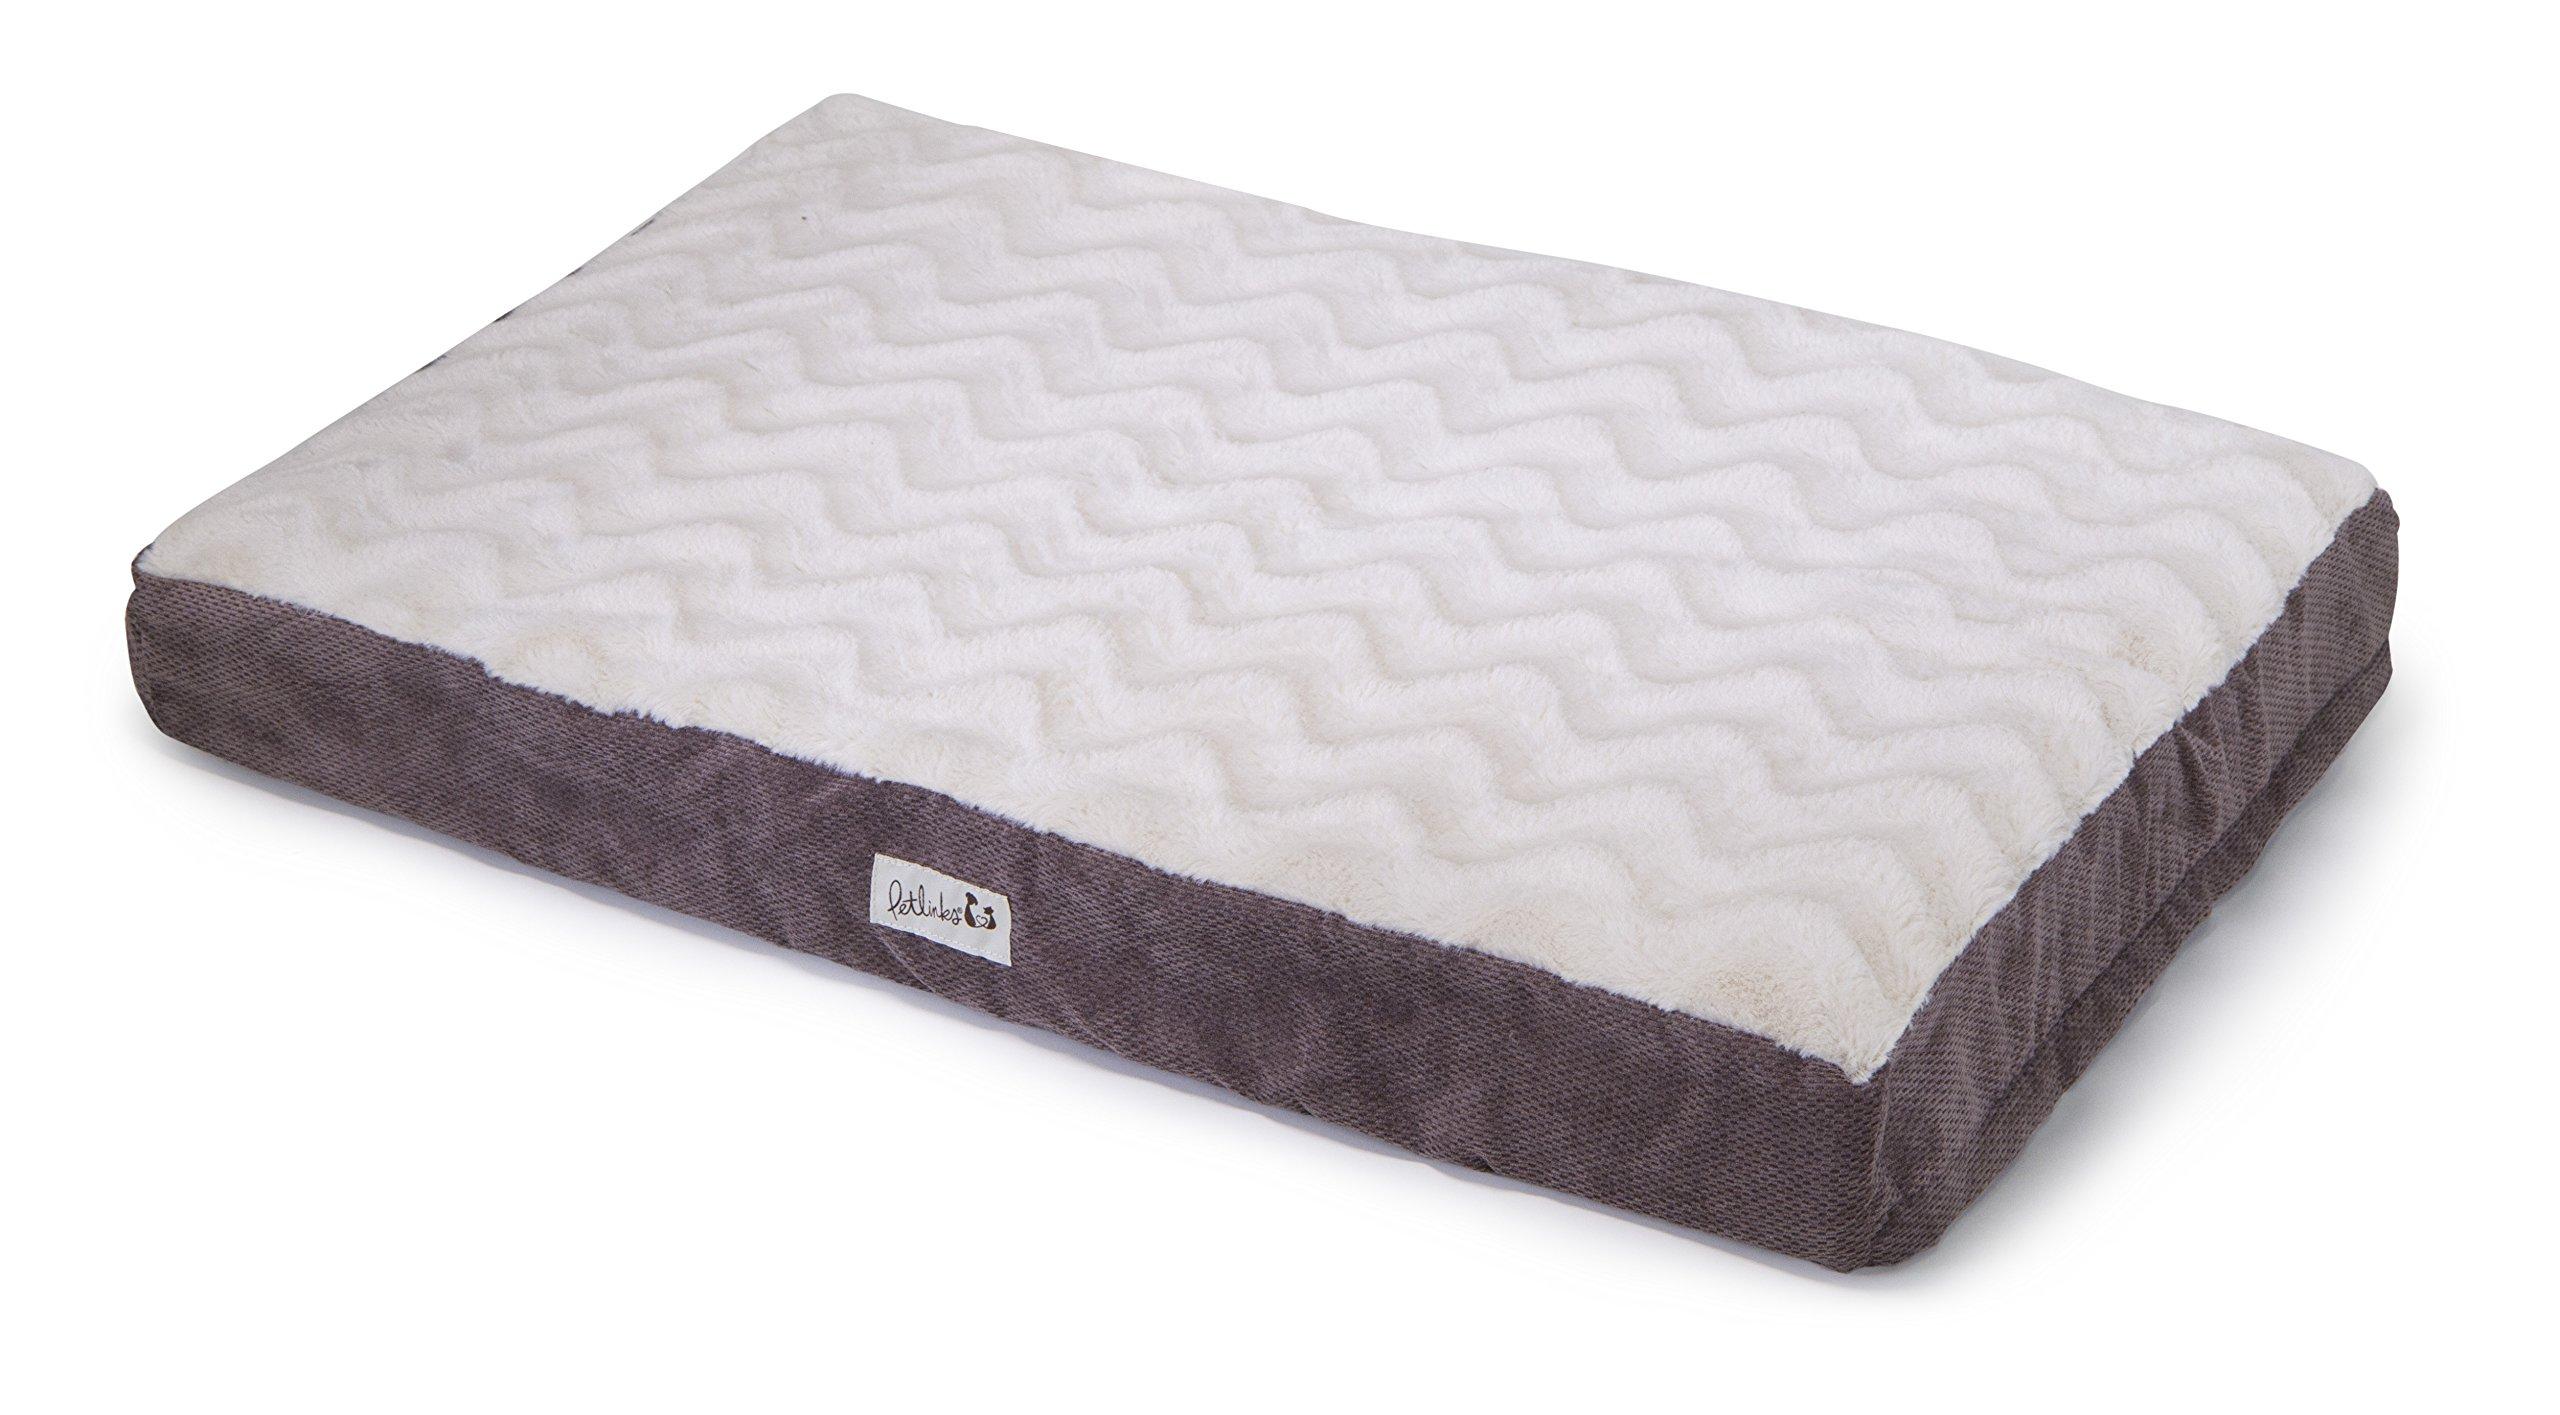 Petlinks Snooze Pad Convoluted Foam Pet Bed, Medium, Cream Plush/Brown